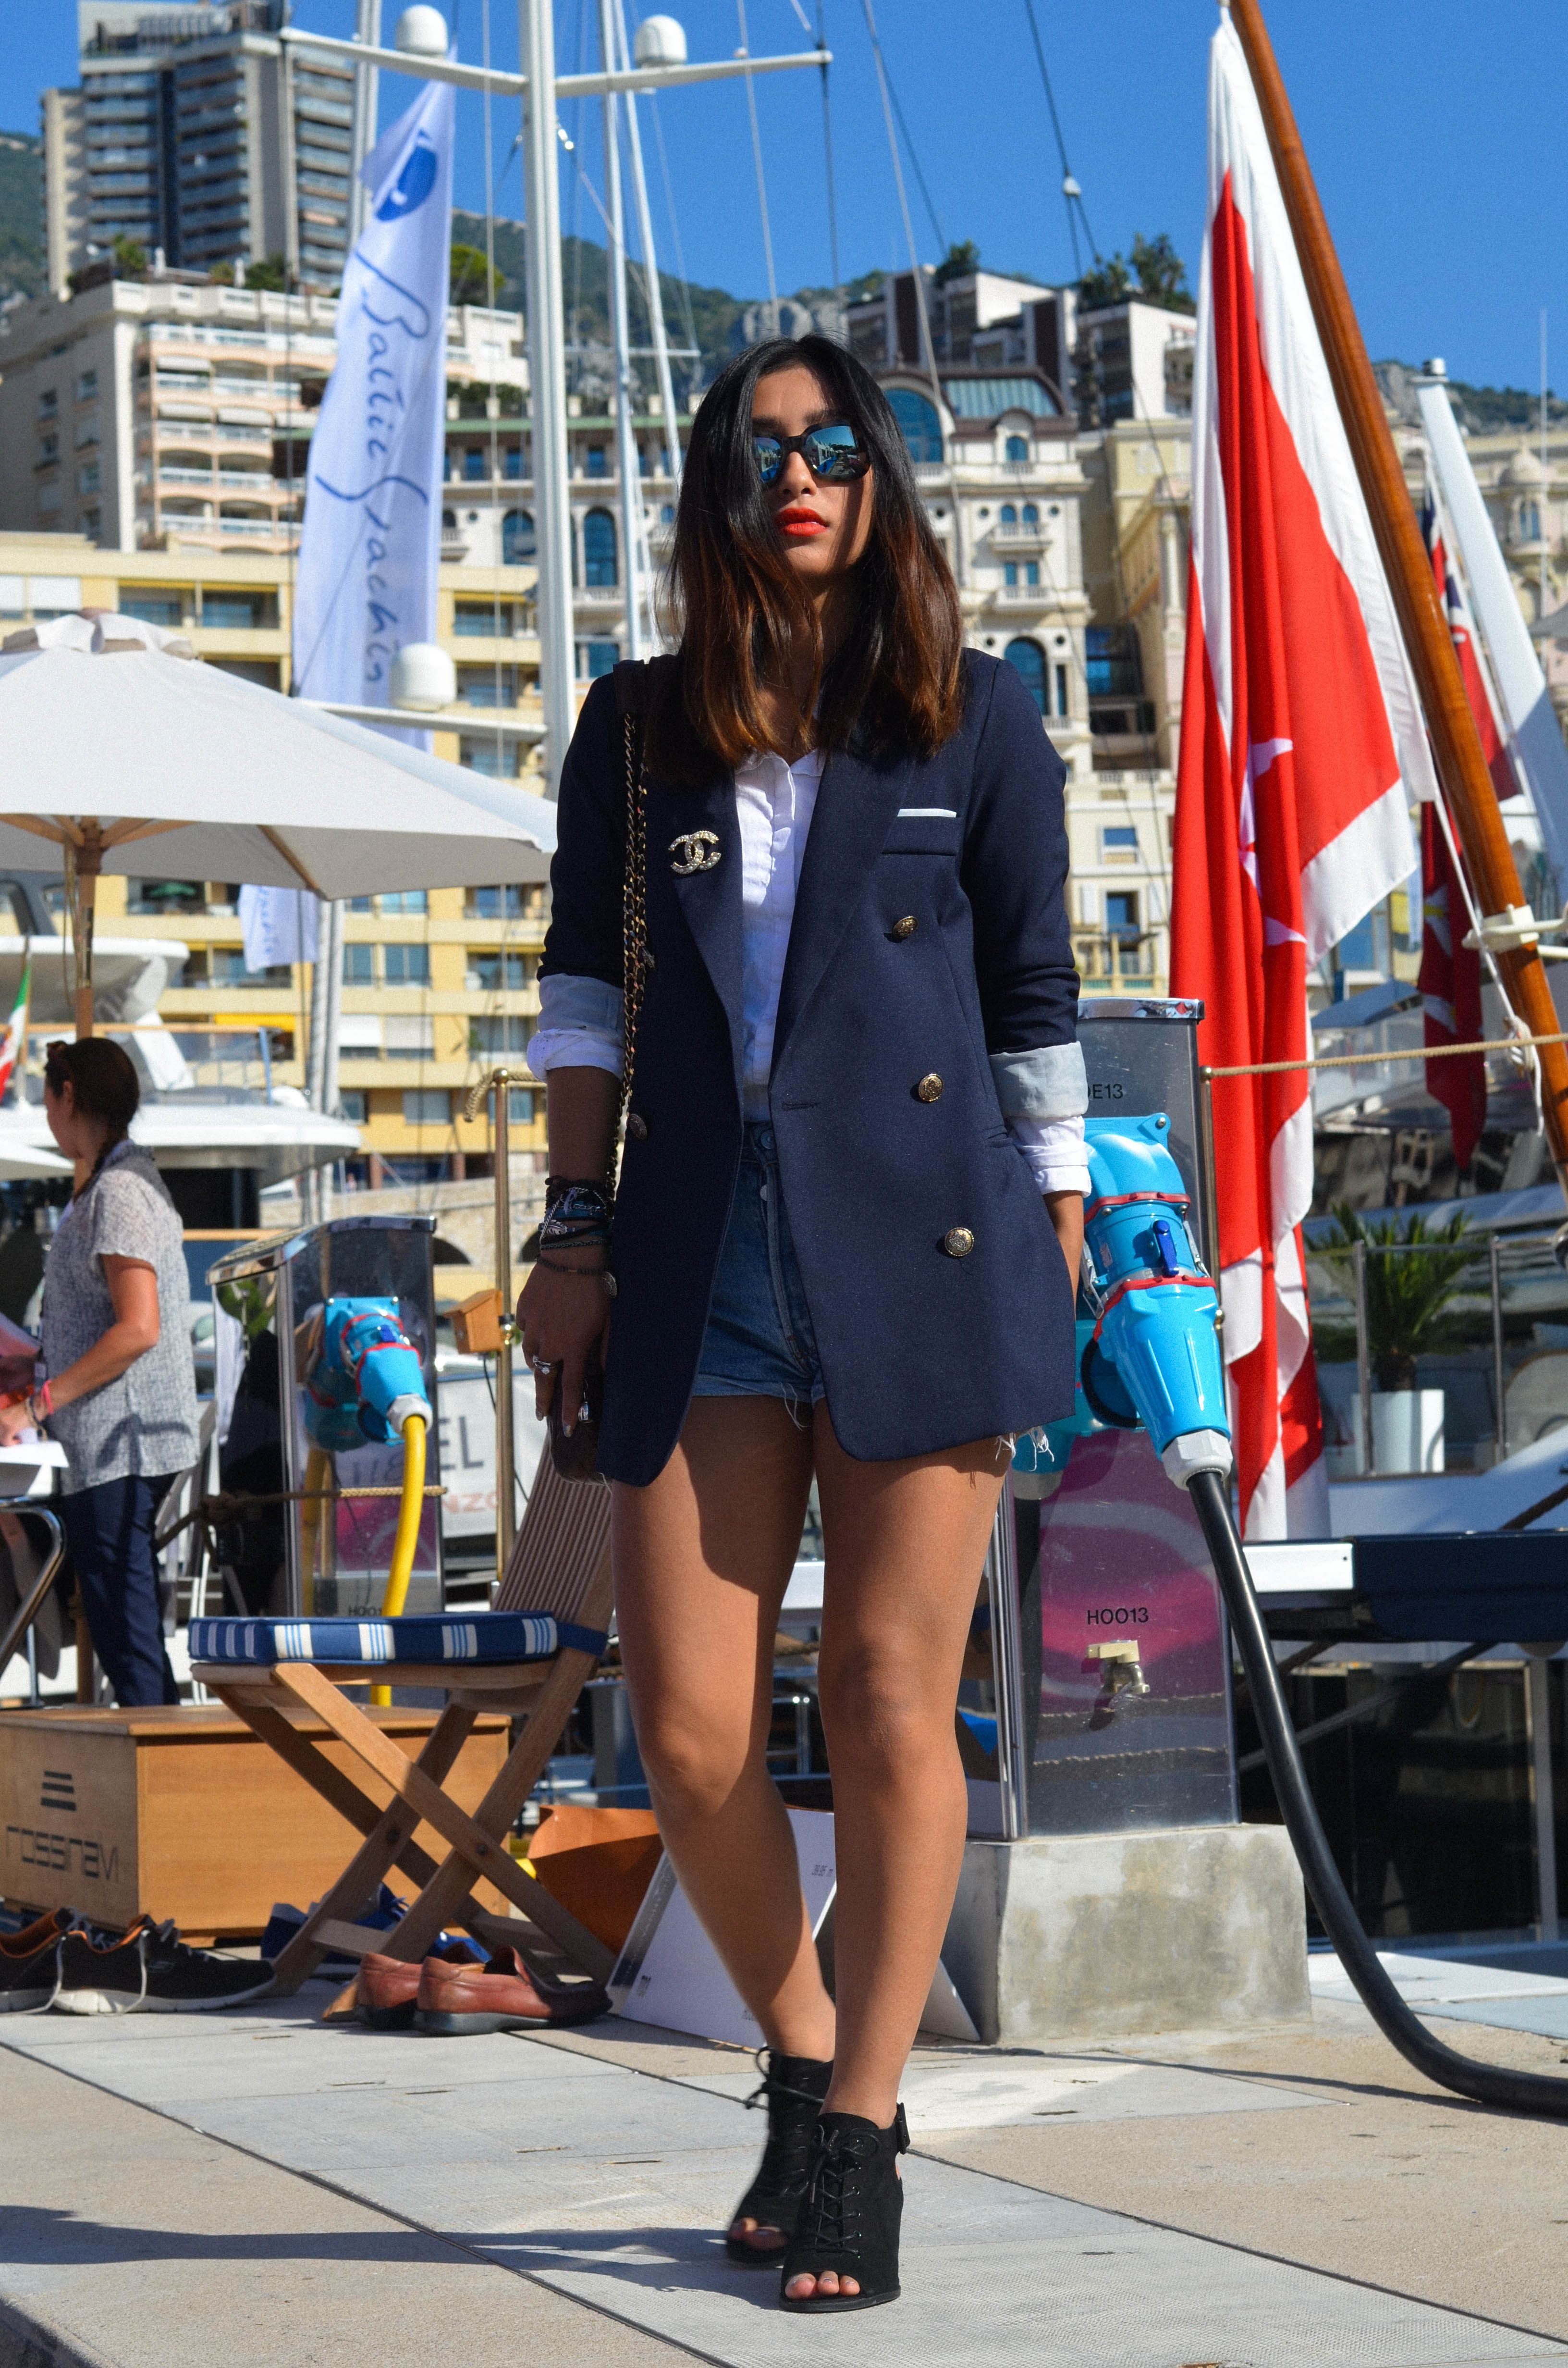 Monaco Yacht show 2015 part II